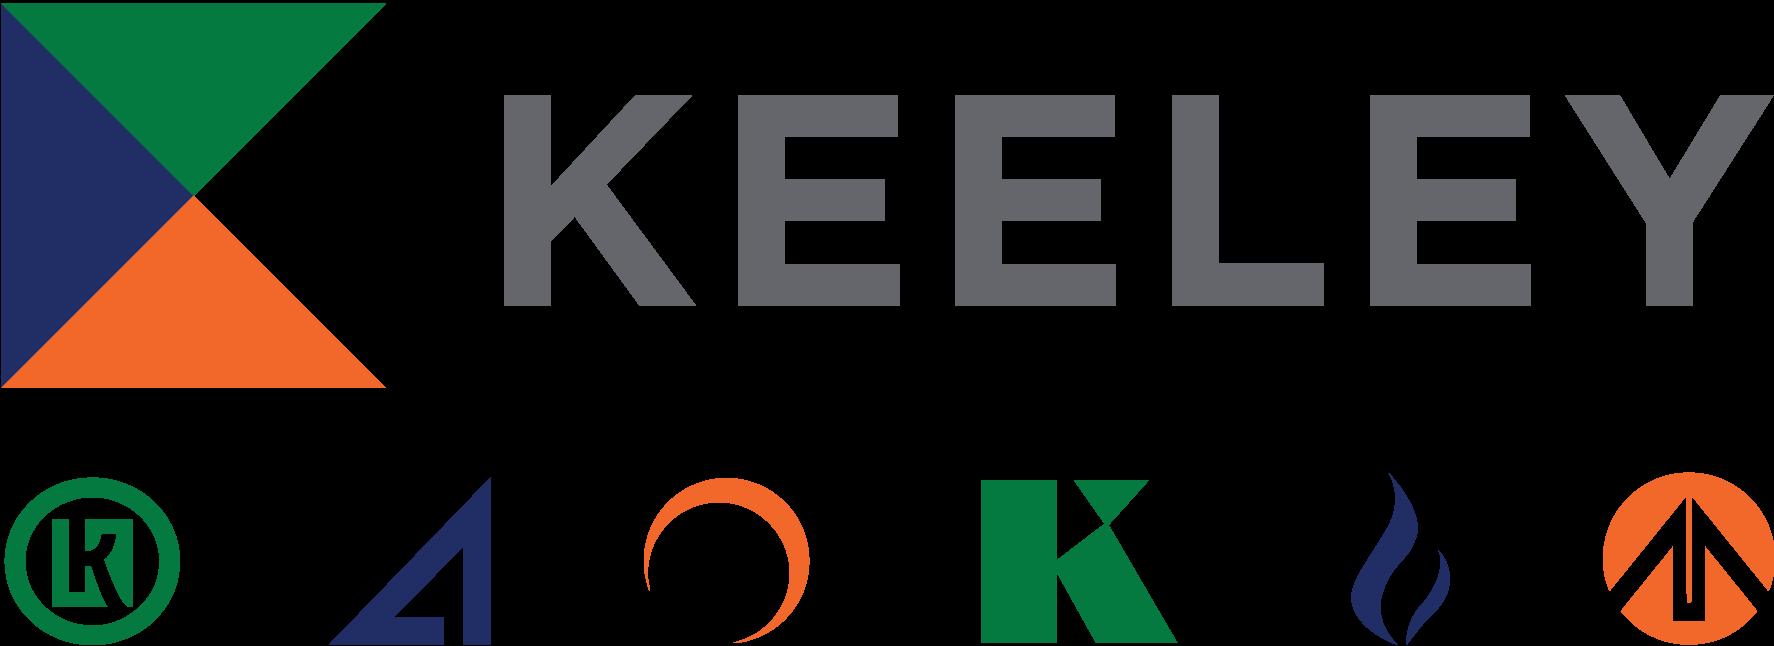 Keeley Companies logo